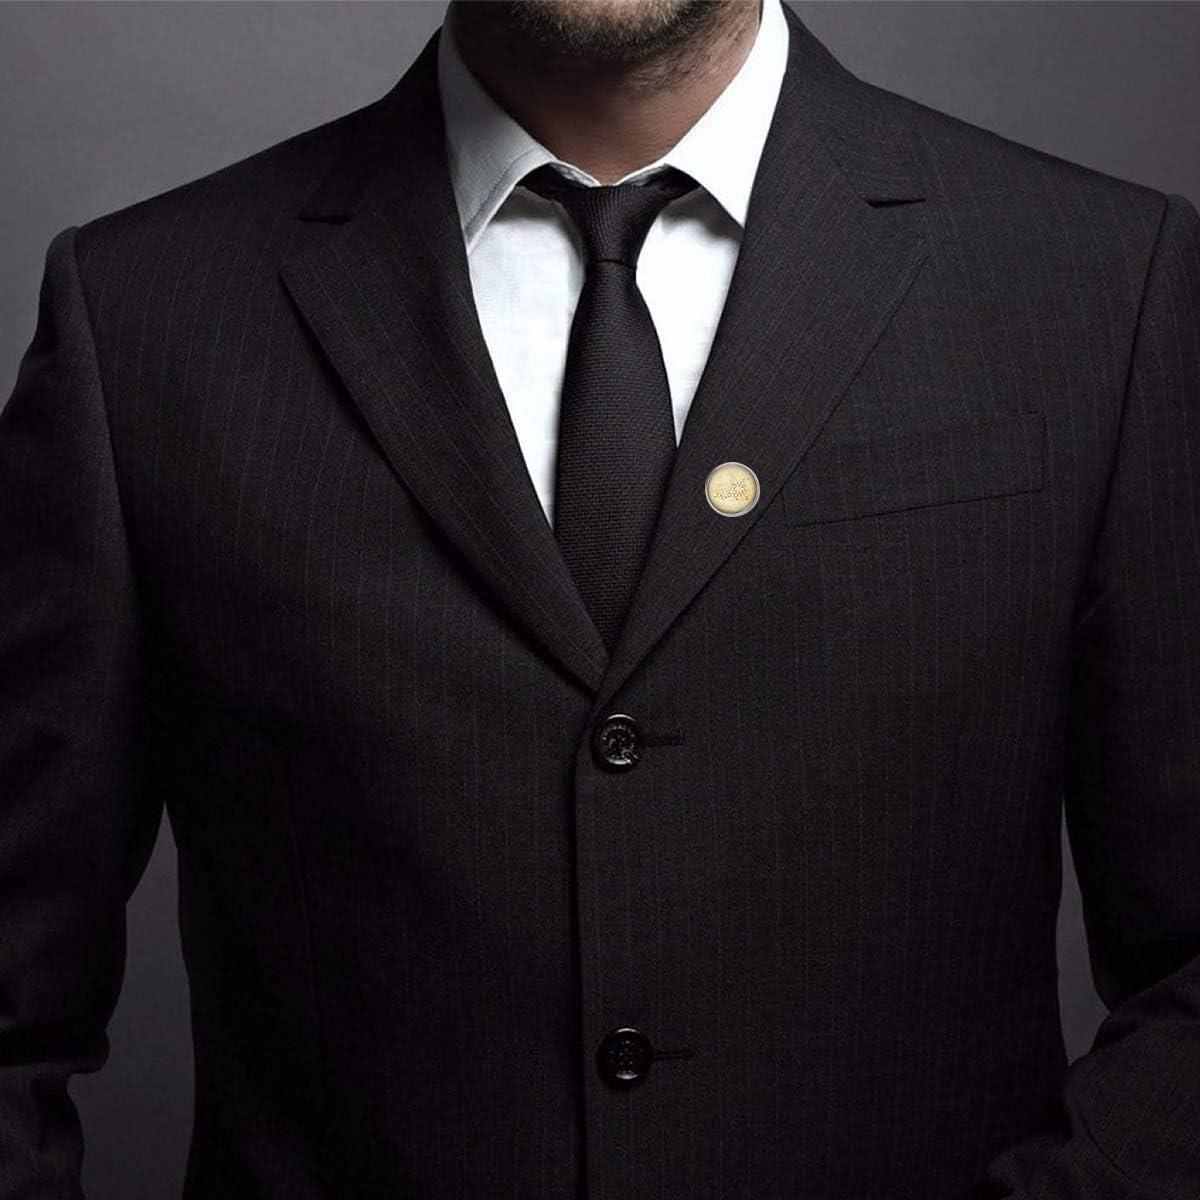 Custom Lapel Pin Brooches Chemical Oxytocin Molecules Banquet Badge Pins Trendy Accessory Jacket T-Shirt Bag Hat Shoe